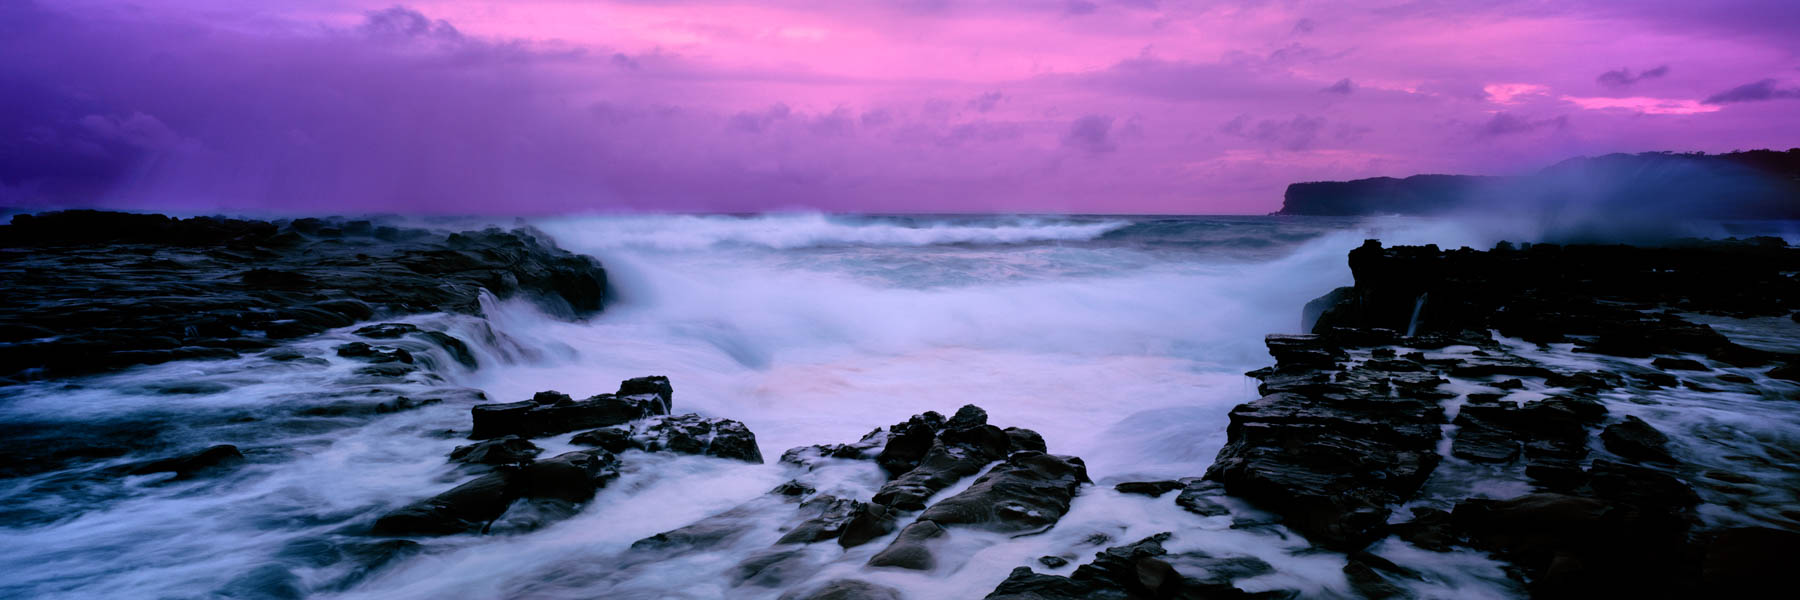 A wild and stormy sunrise at Avoca Beach, Central Coast, NSW, Australia.